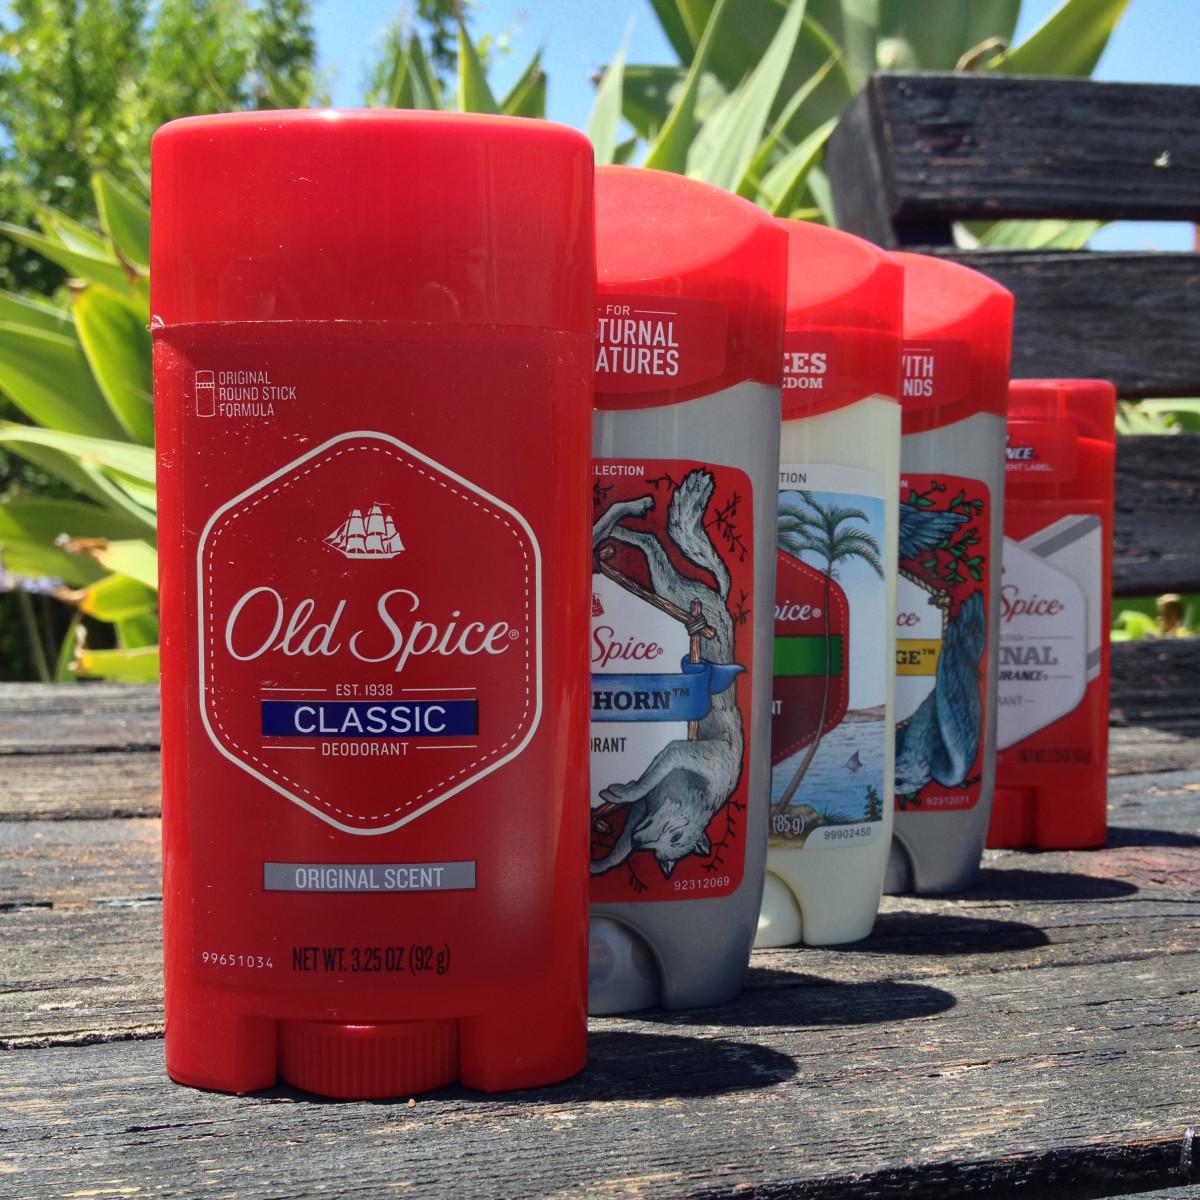 Men's Deodorant for Women?